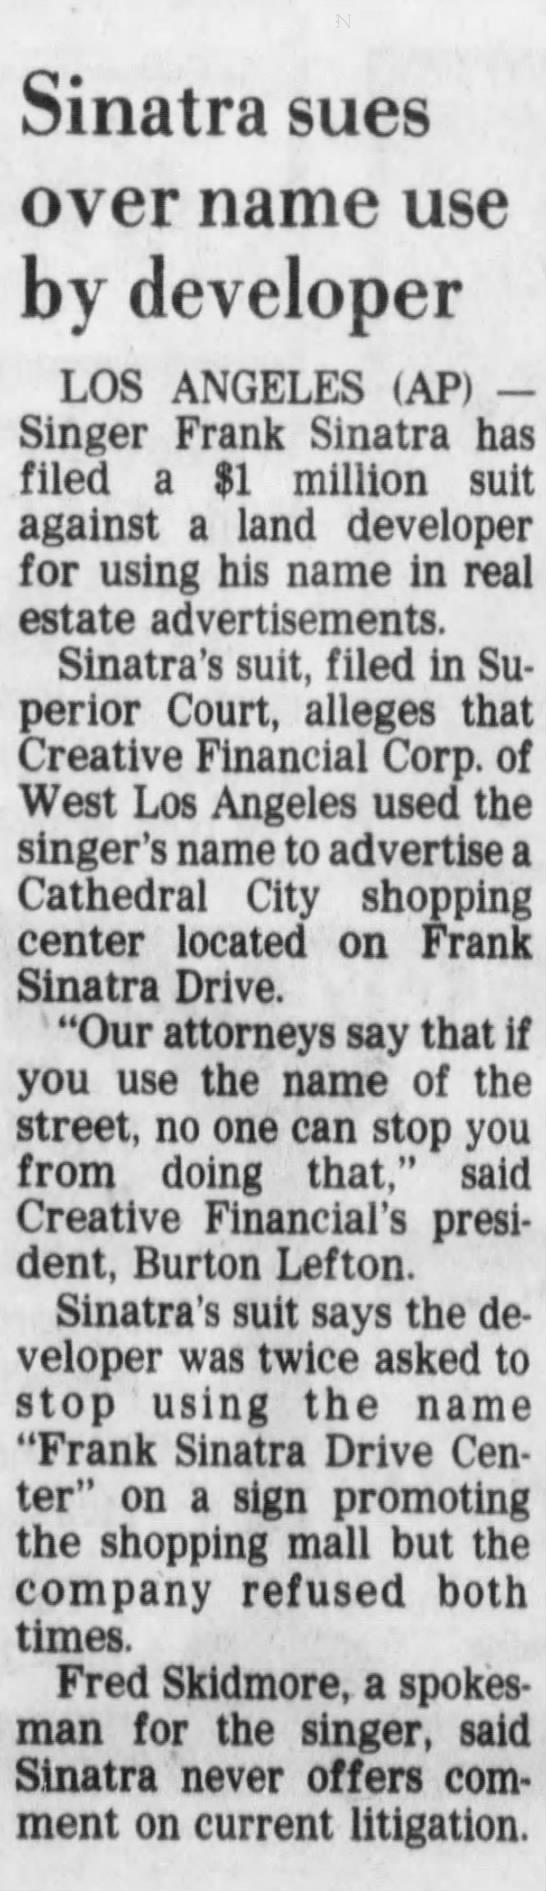 Sinatra sues for $ 1 million -